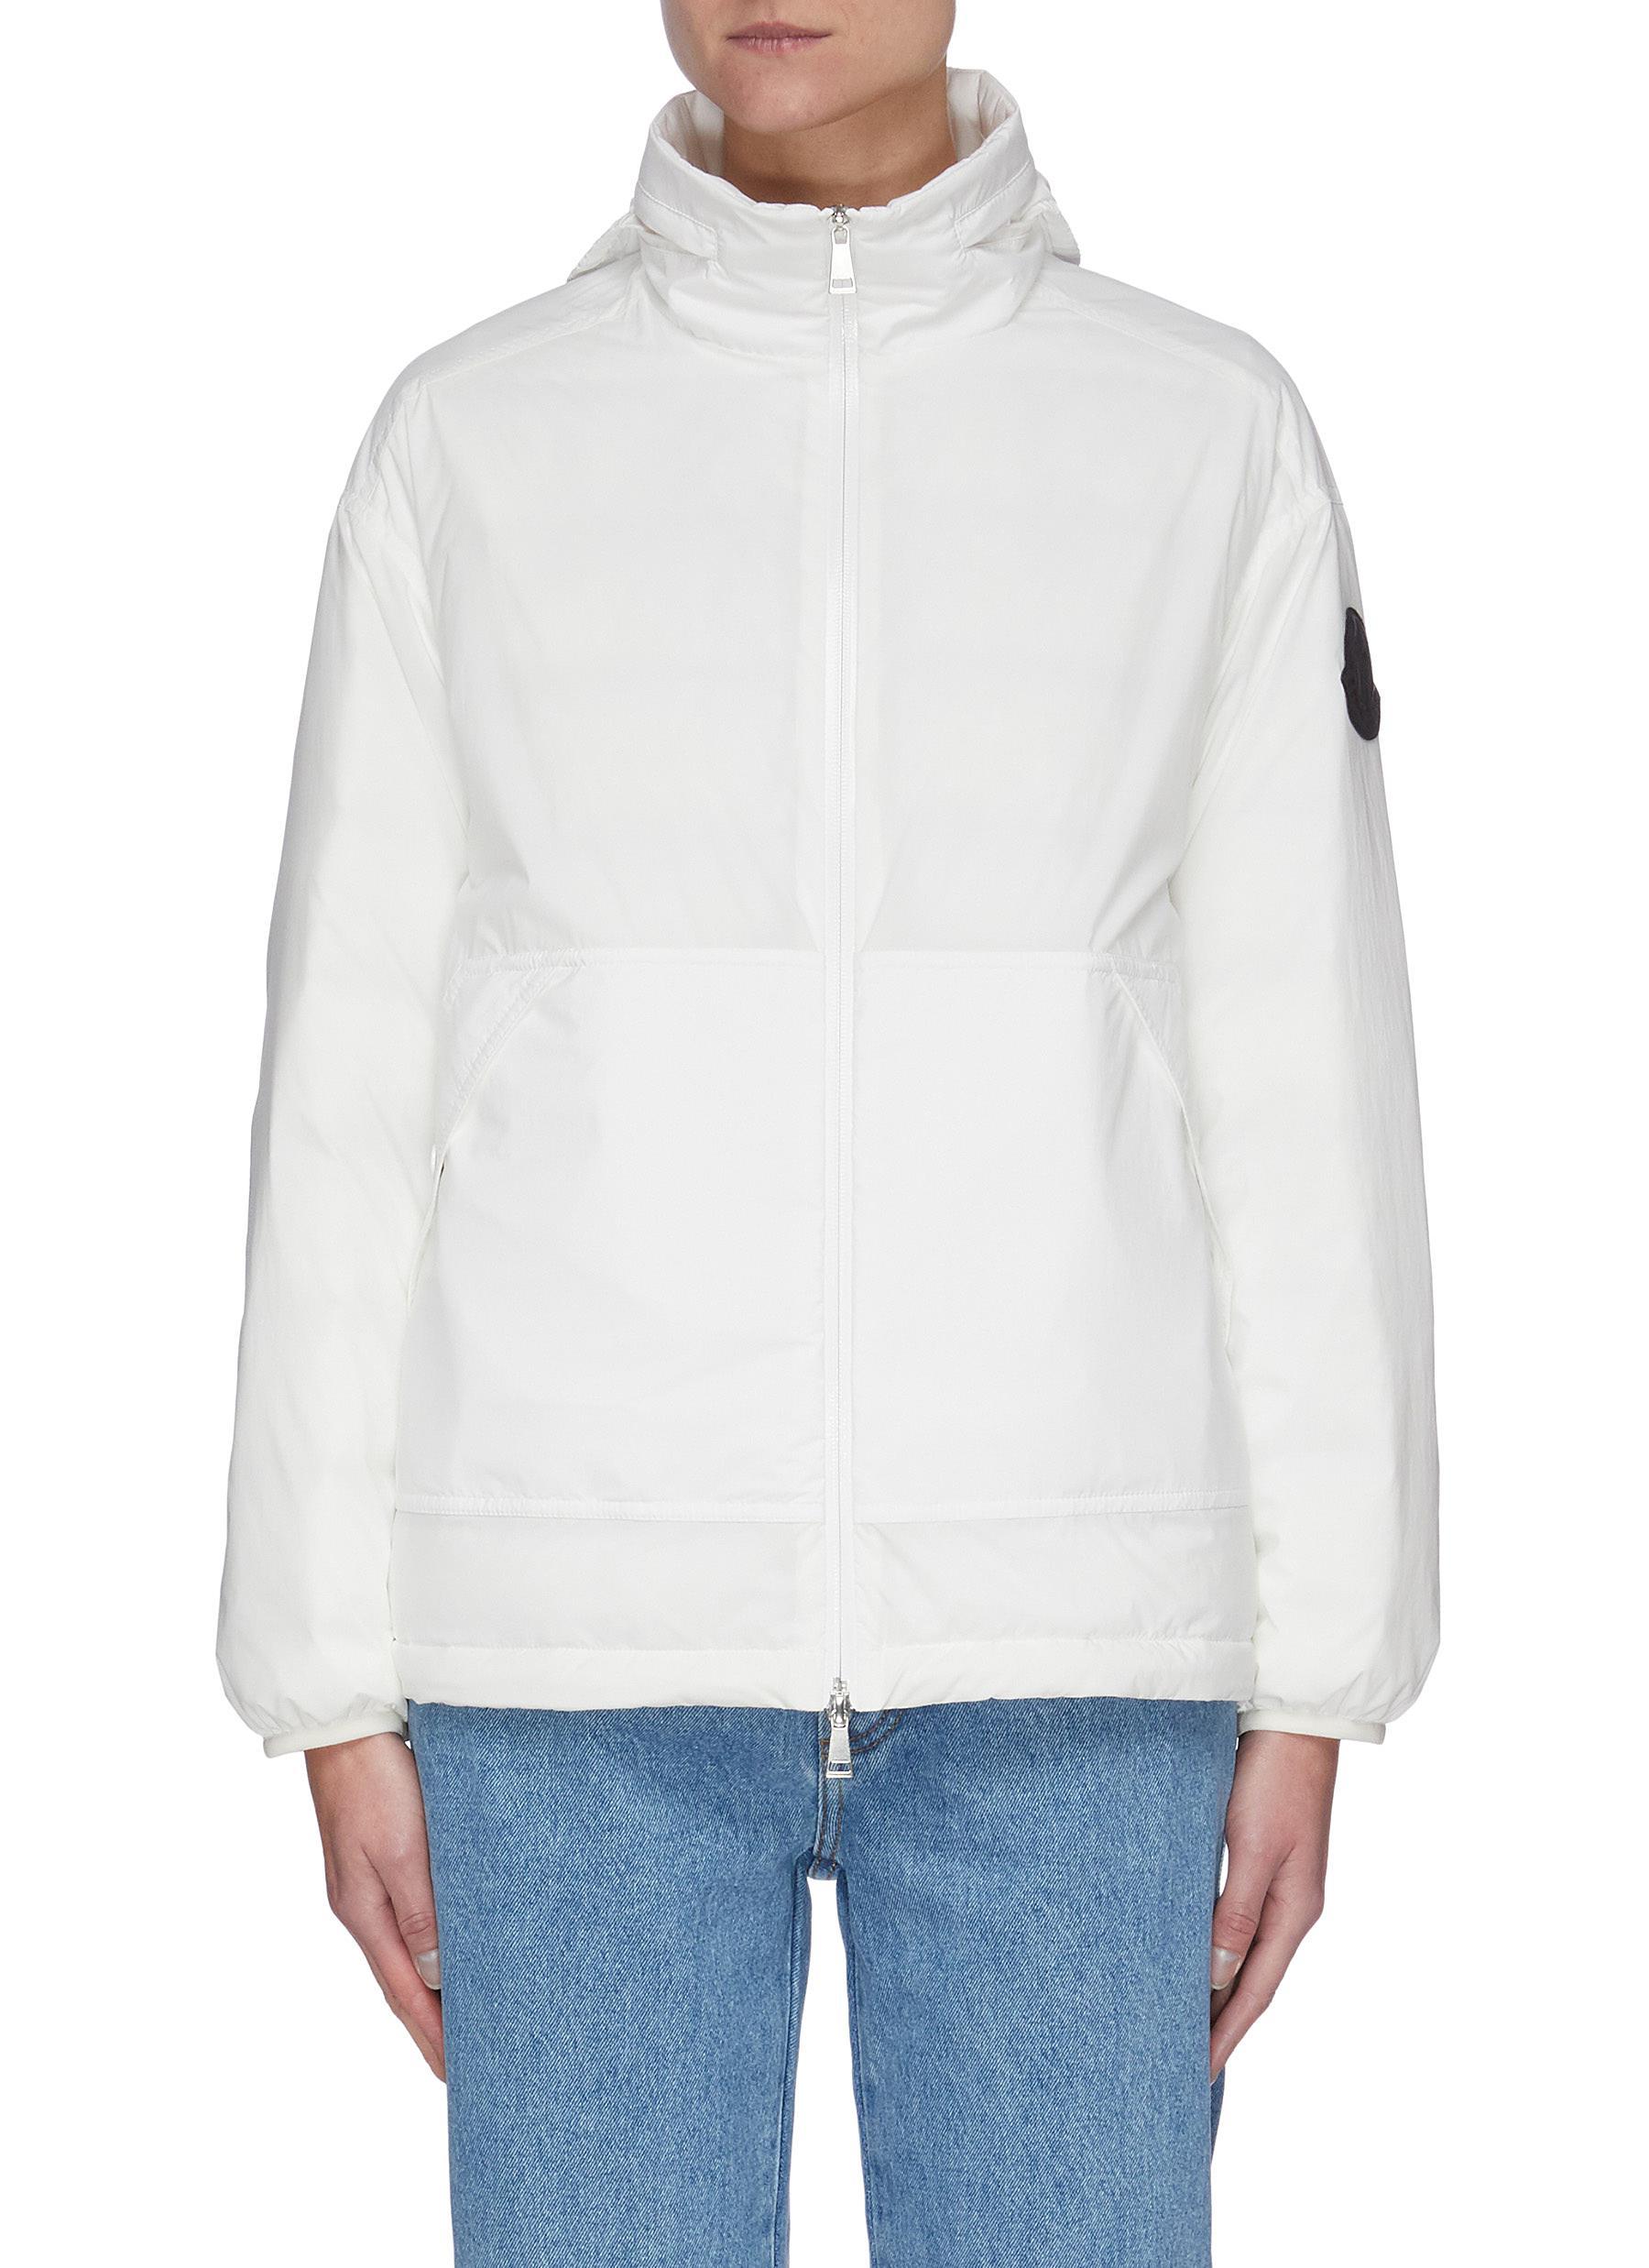 Menchib' Back Logo Hood Down Jacket